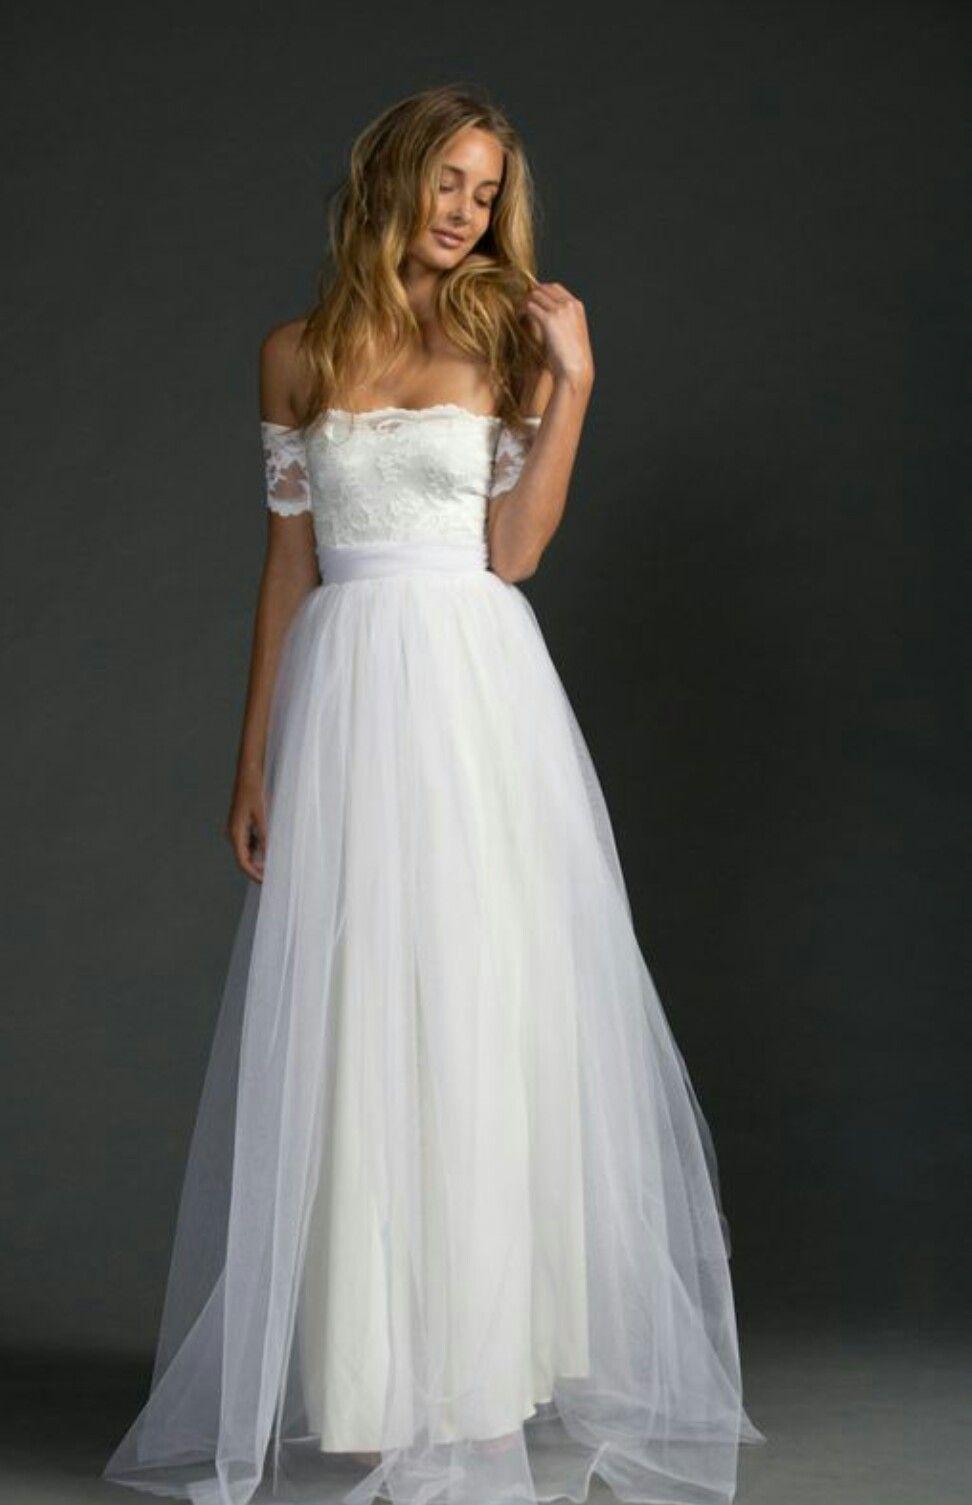 Nice dresses for wedding  Nice  Bodas  Pinterest  Nice Wedding dress and Wedding